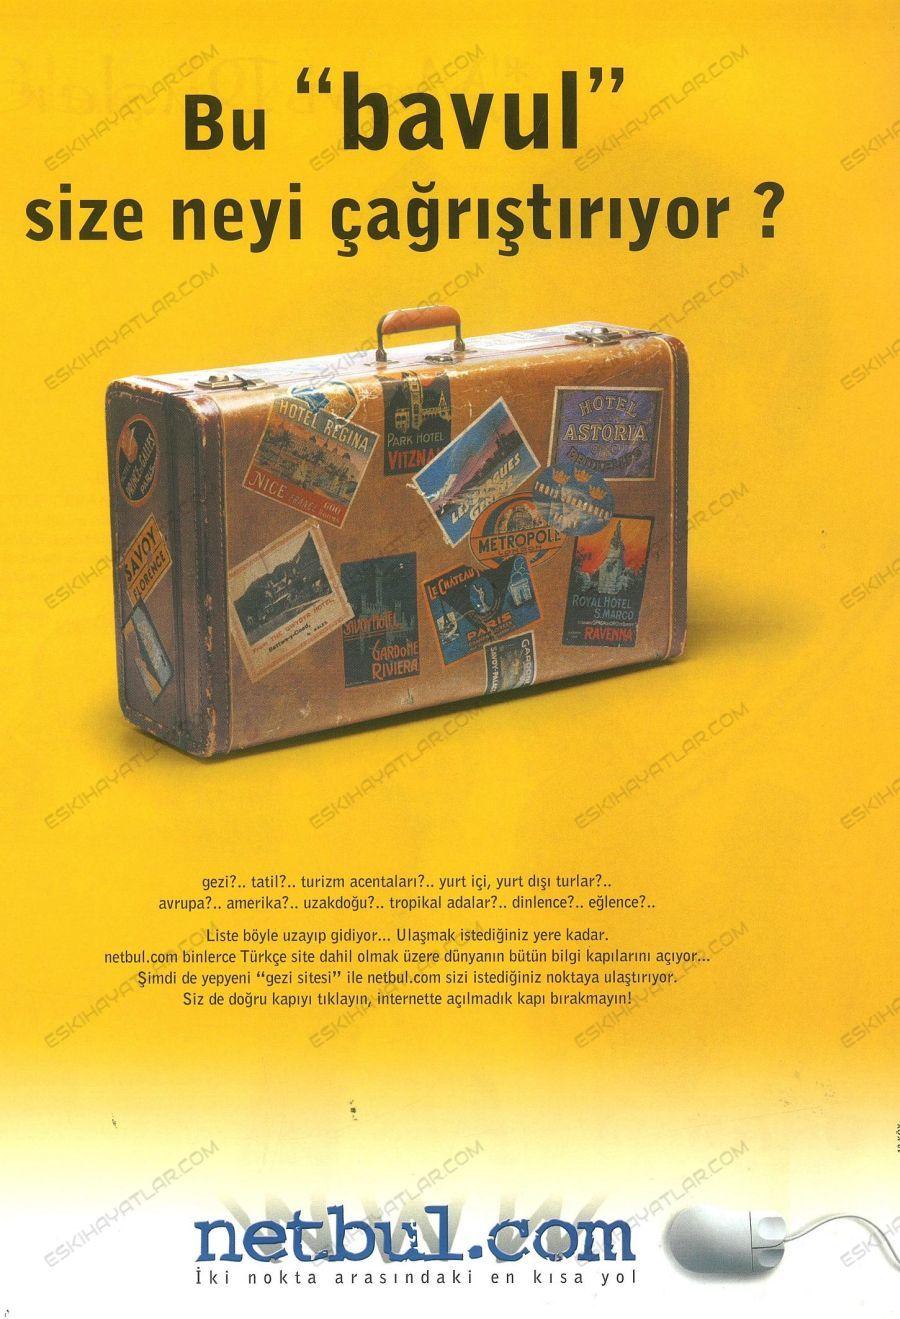 0384-bu-bavul-size-neyi-cagristiriyor-2000-yilinda-internet-kullanimi-netbul-com-reklamlari